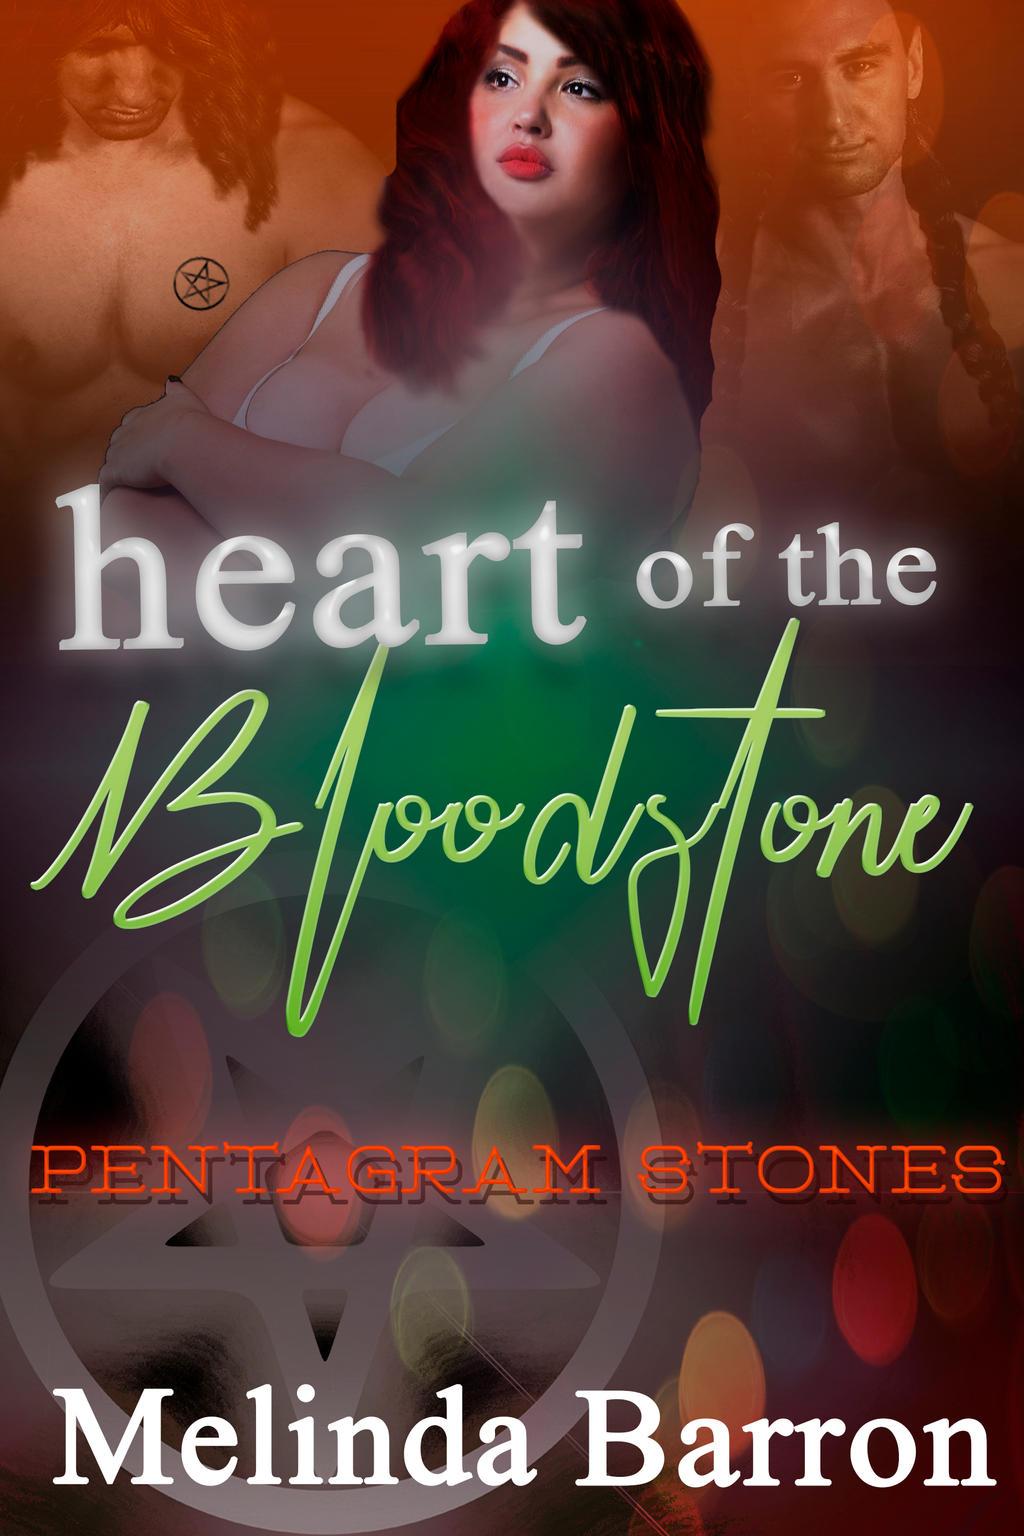 Heart of the Bloodstone